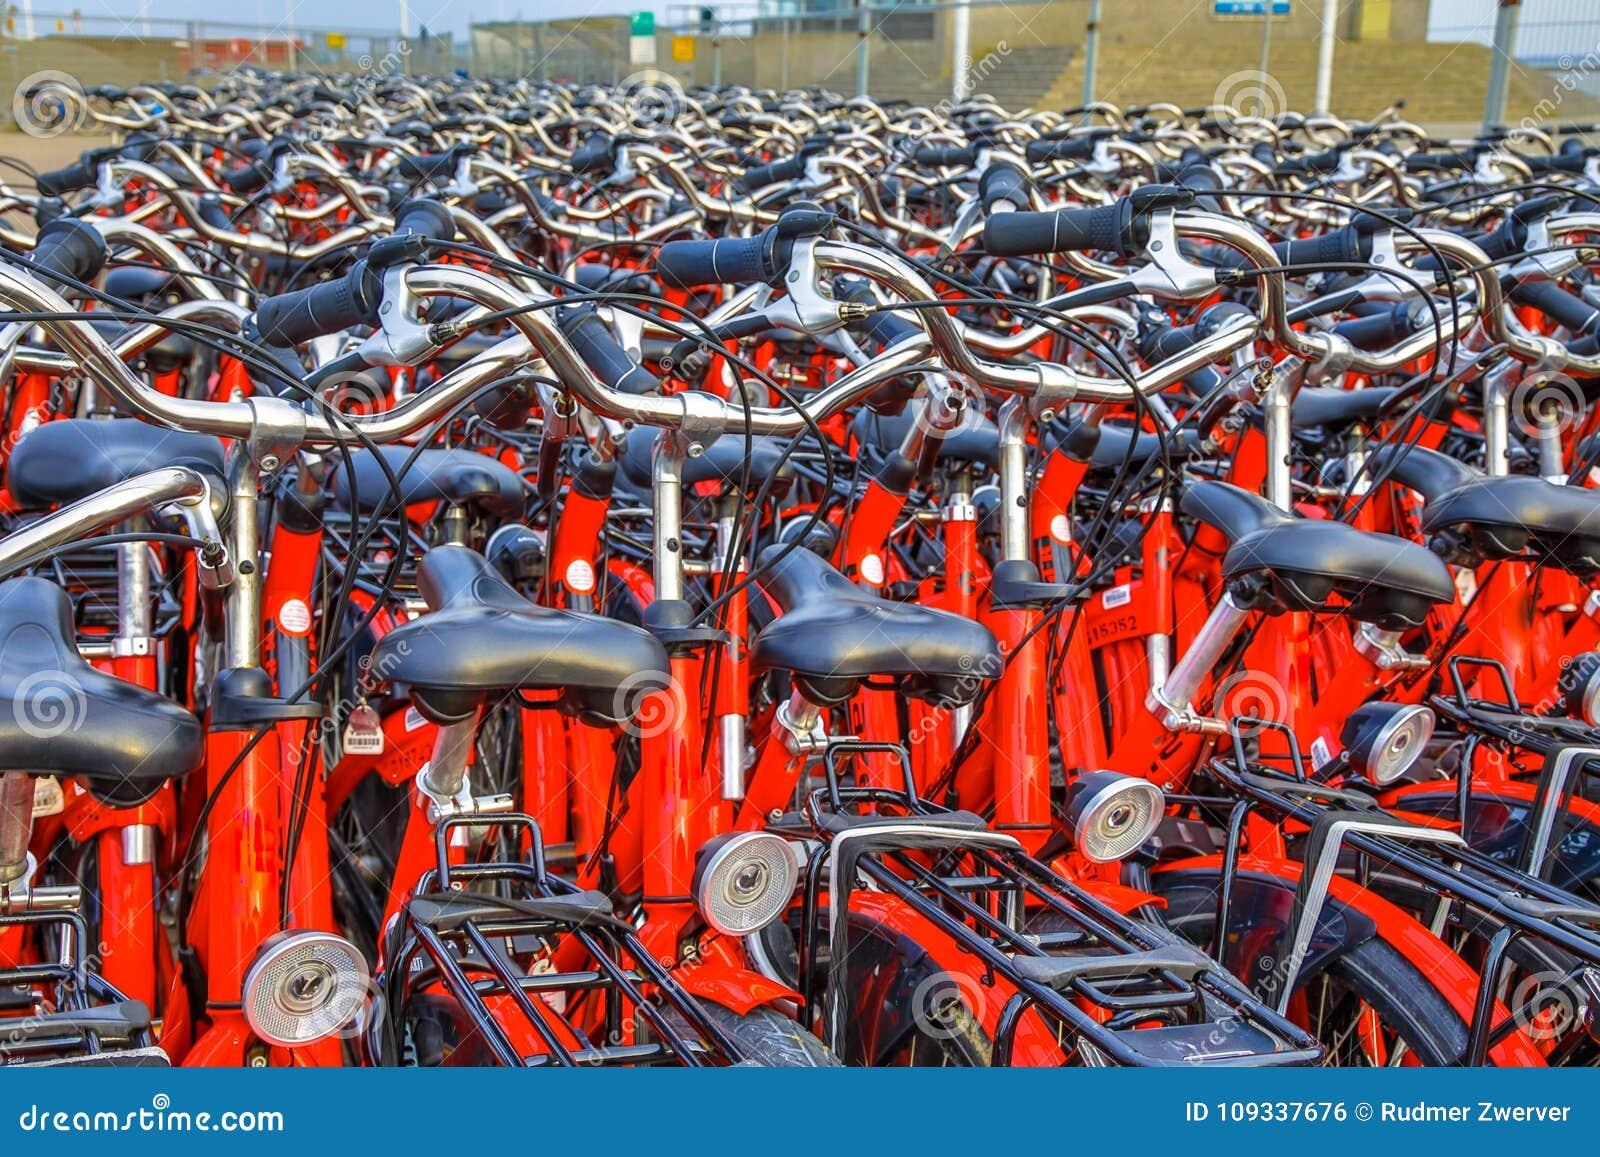 Rental bicycle parking